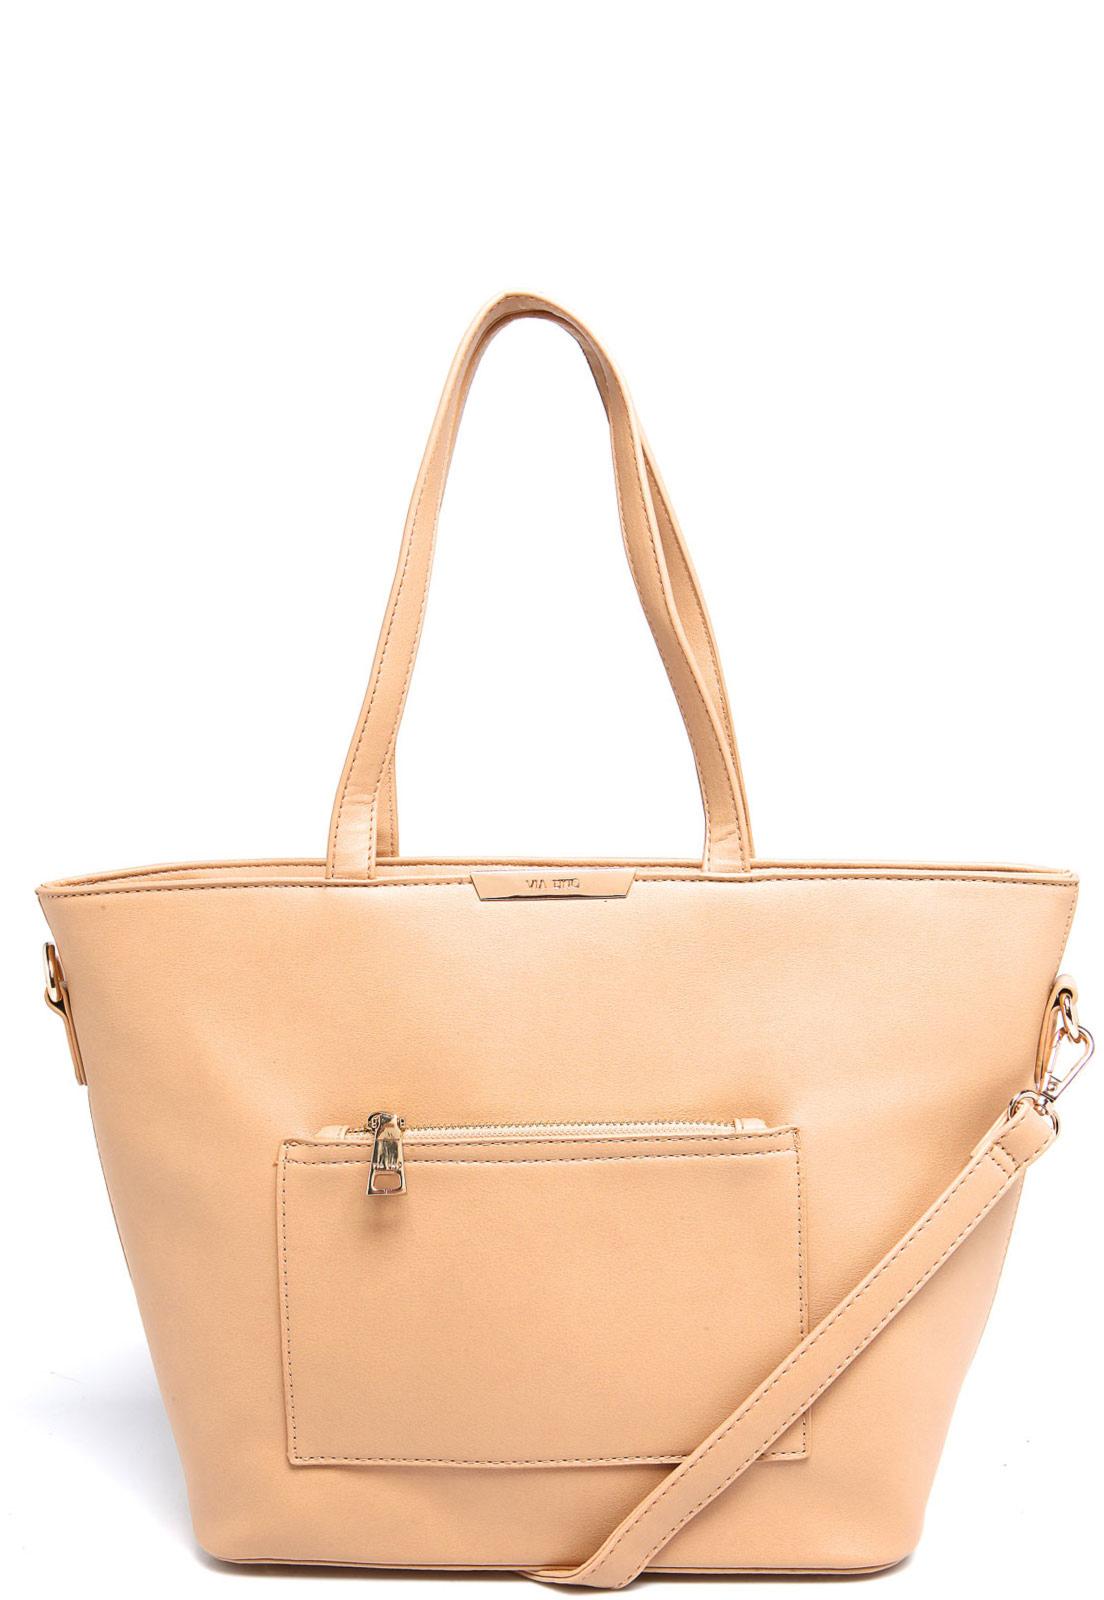 b87ce4655 Bolsa Trapézio VIA UNO Bolso Bege | Products | Pinterest | Bags ...